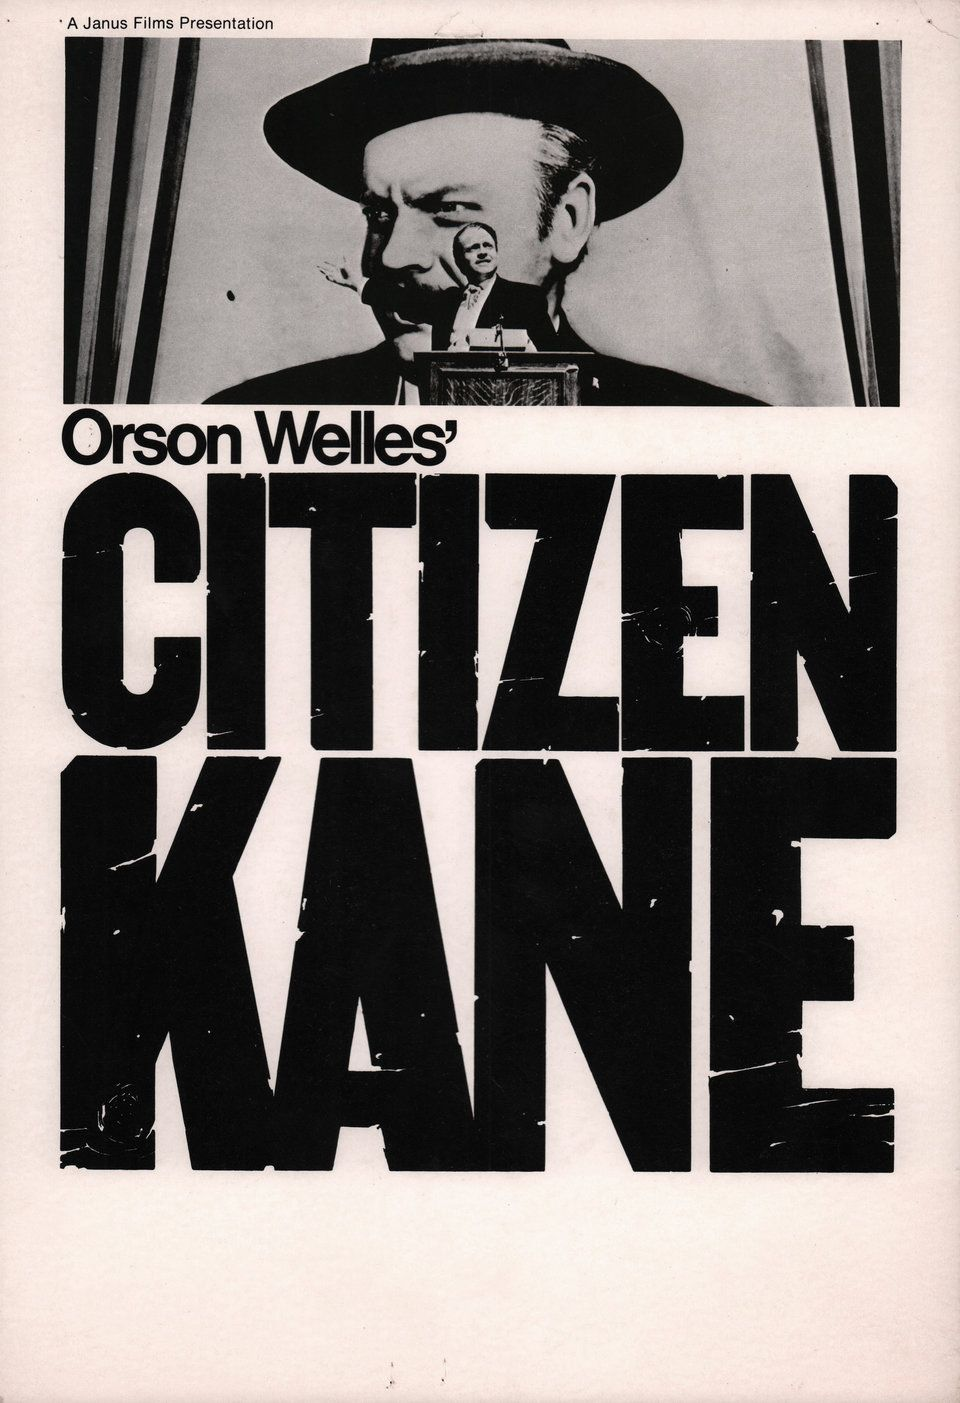 Citizen Kane R1960s U S Mini Window Card Poster Posteritati Movie Poster Gallery New York Posteres De Filmes Poster Filmes